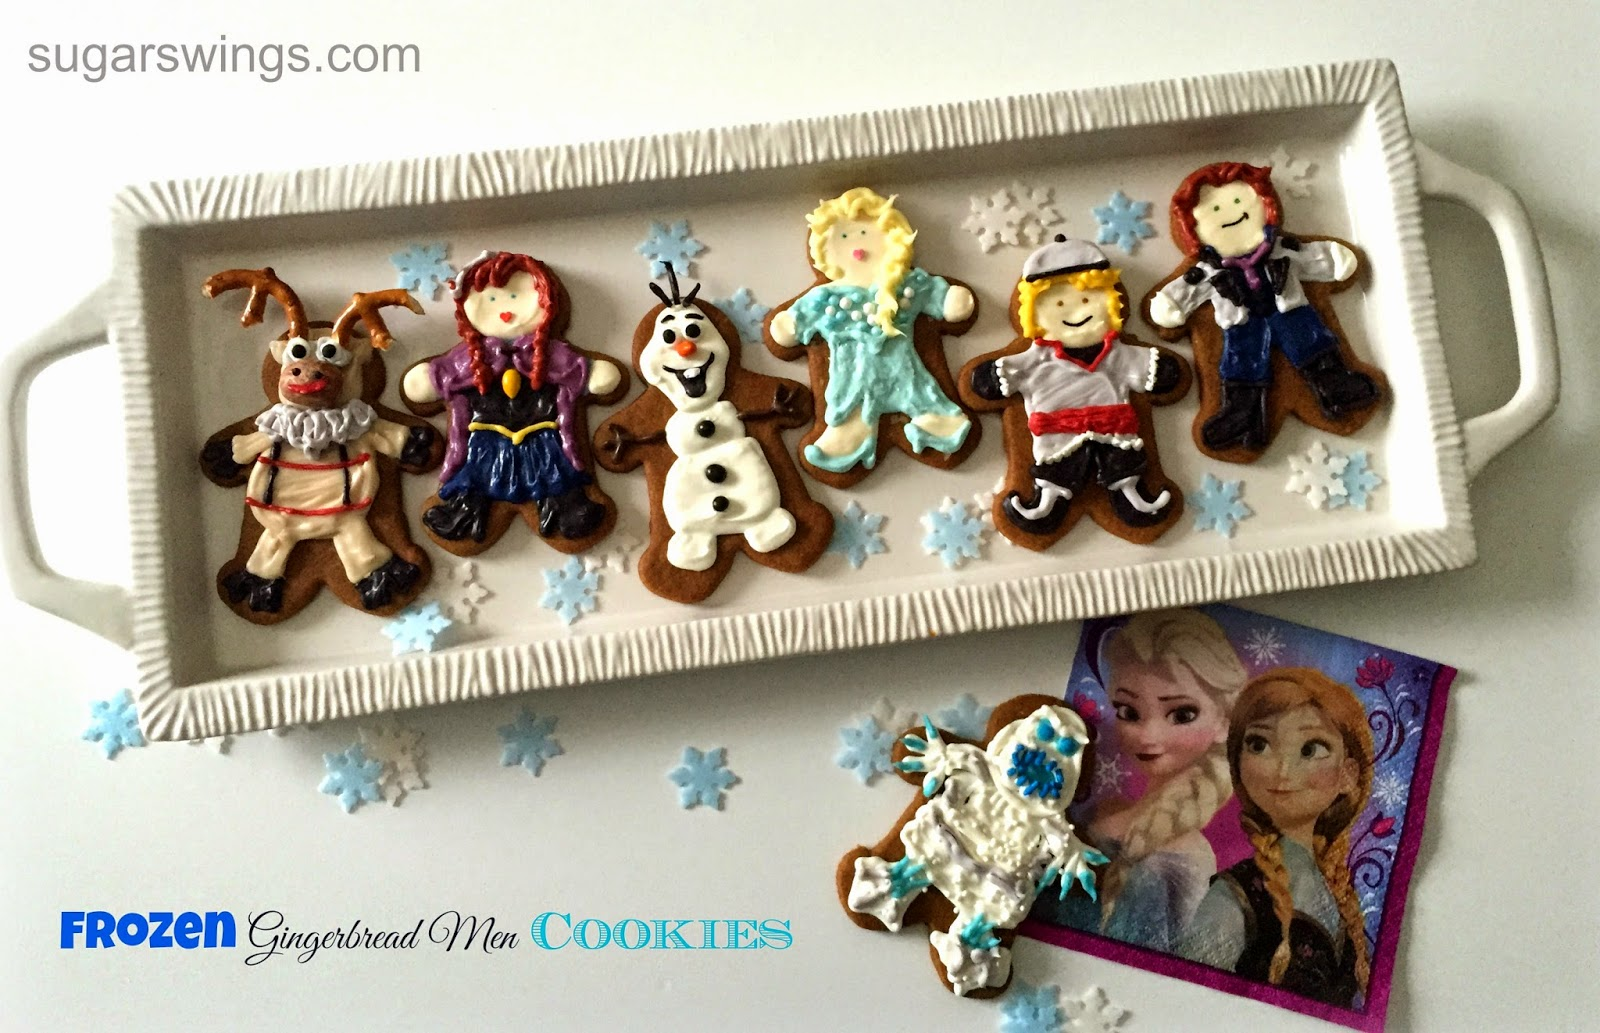 Sugar Swings! Serve Some: The Nightmare Before Christmas Gingerbread ...